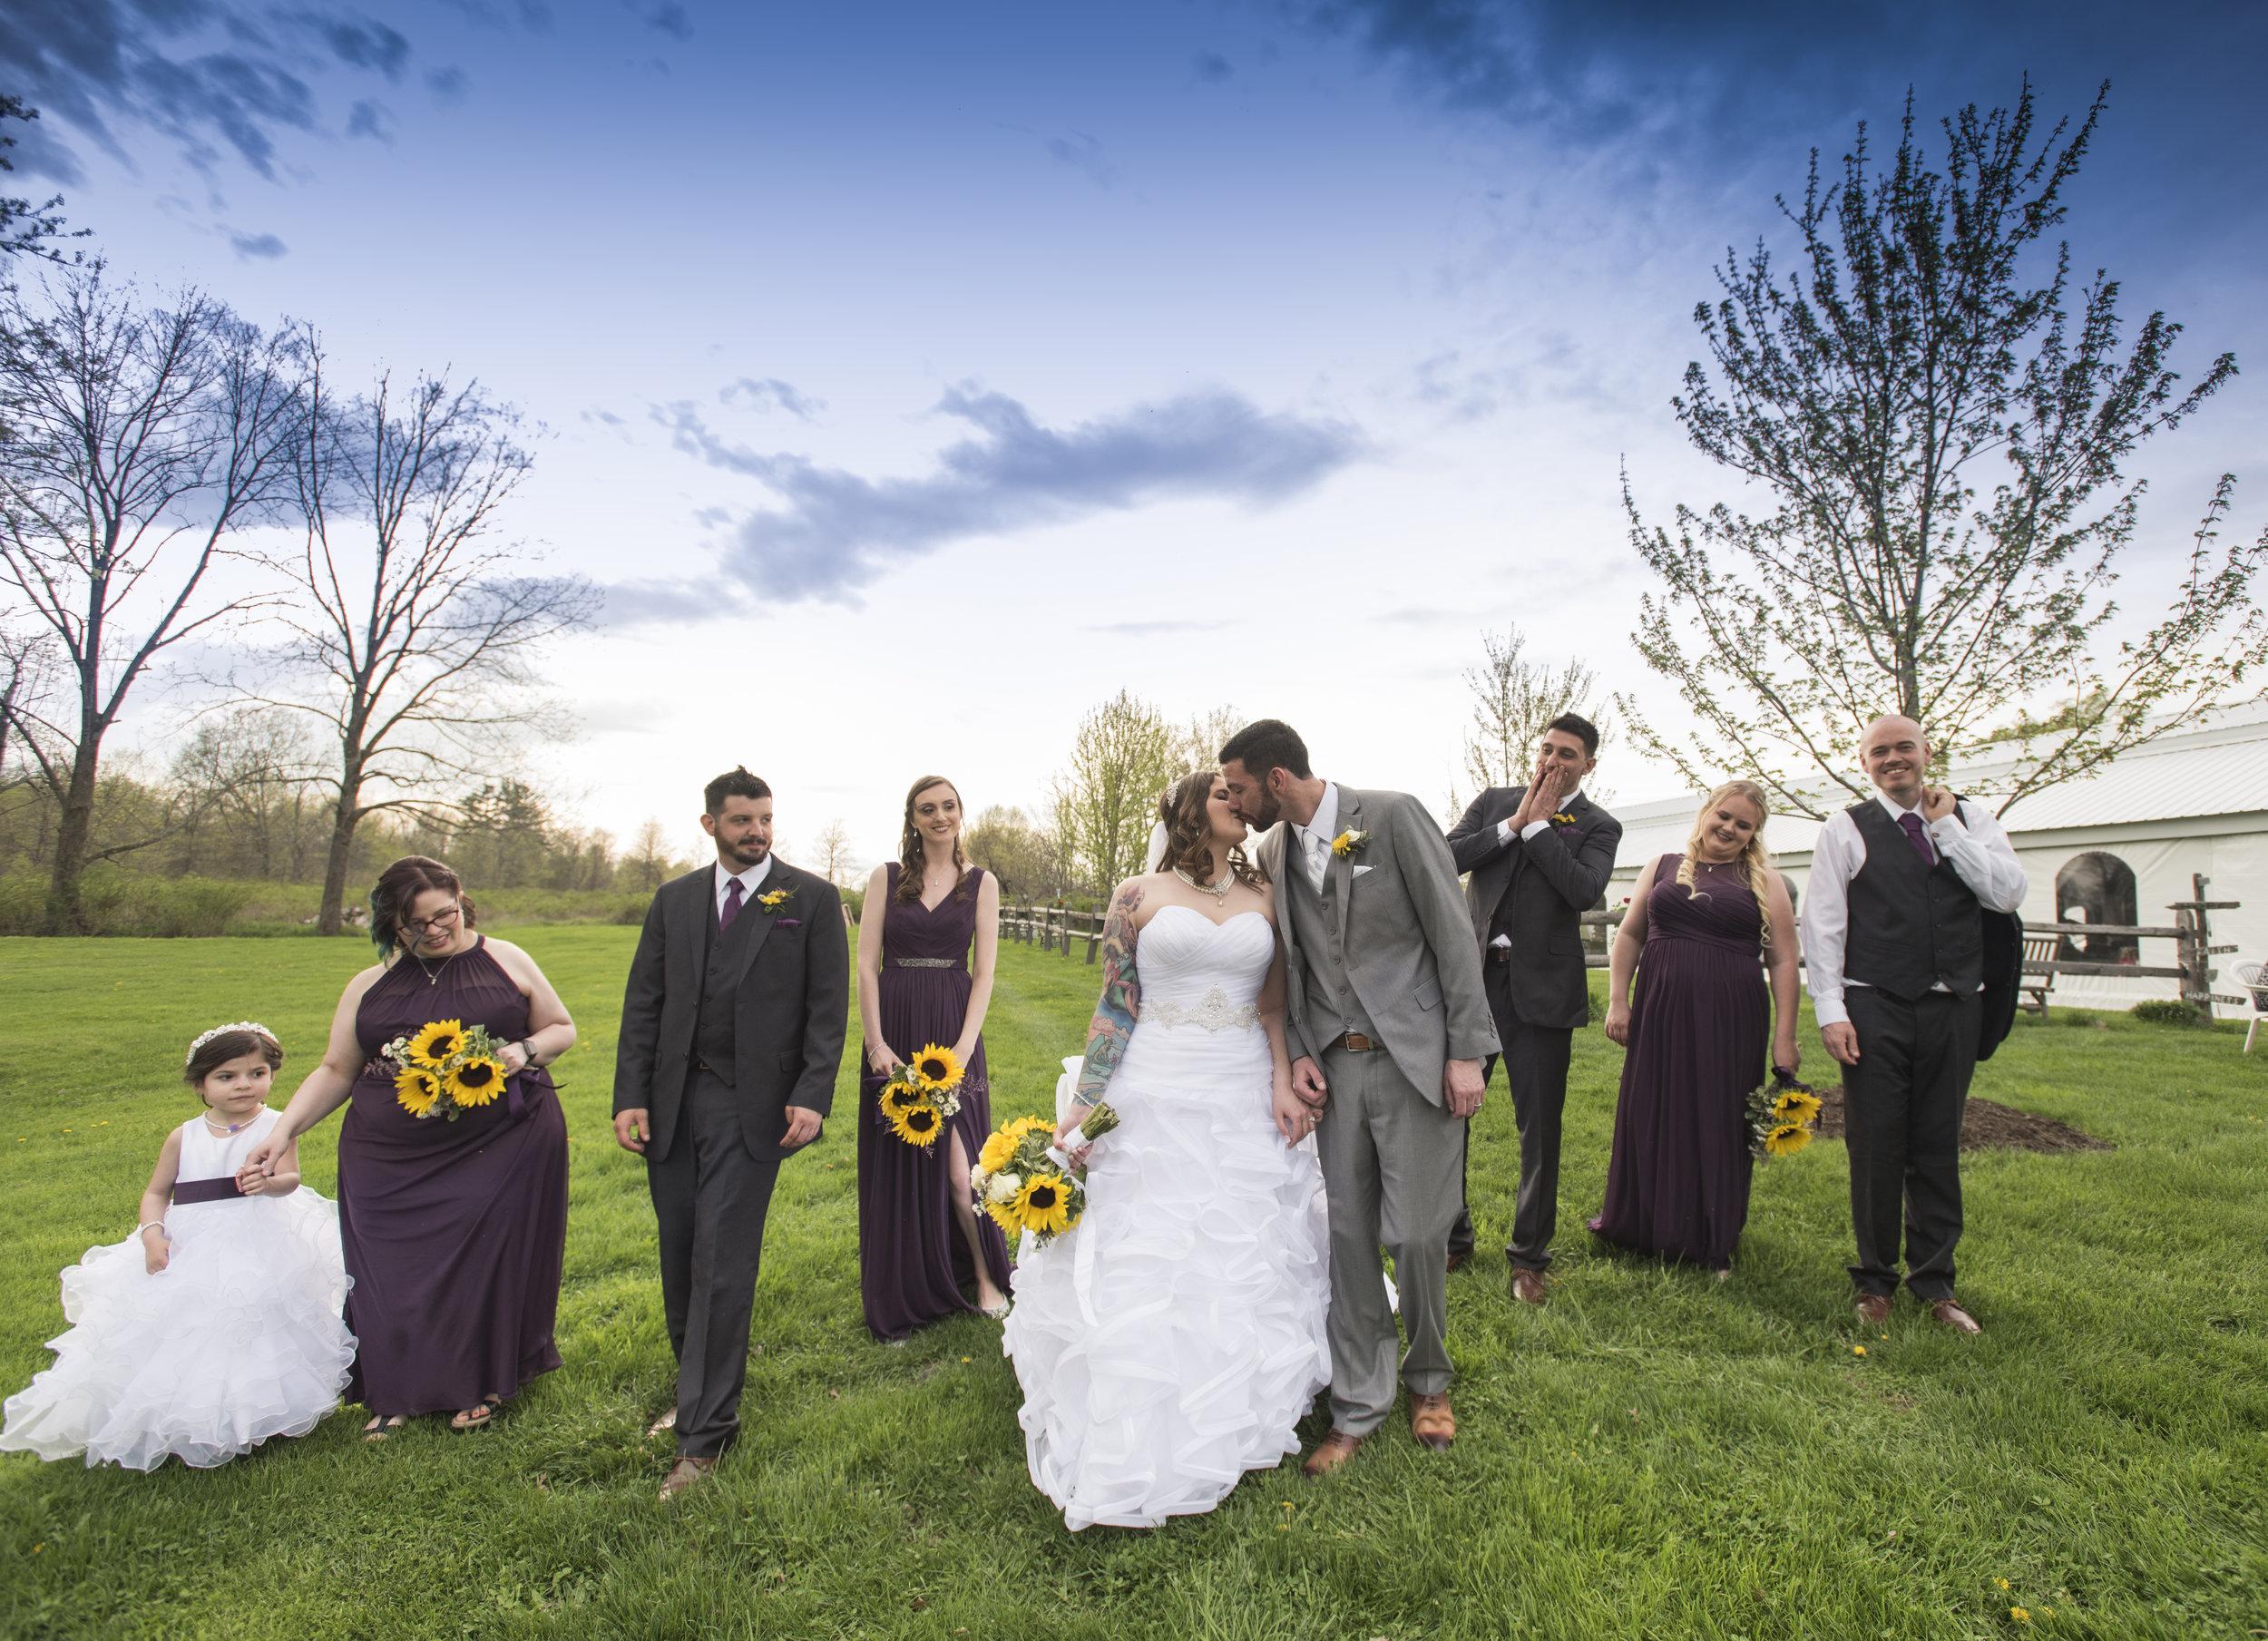 Lippincott manor weddings, wallkill ny wedding, photography, weddings, photos i.jpg